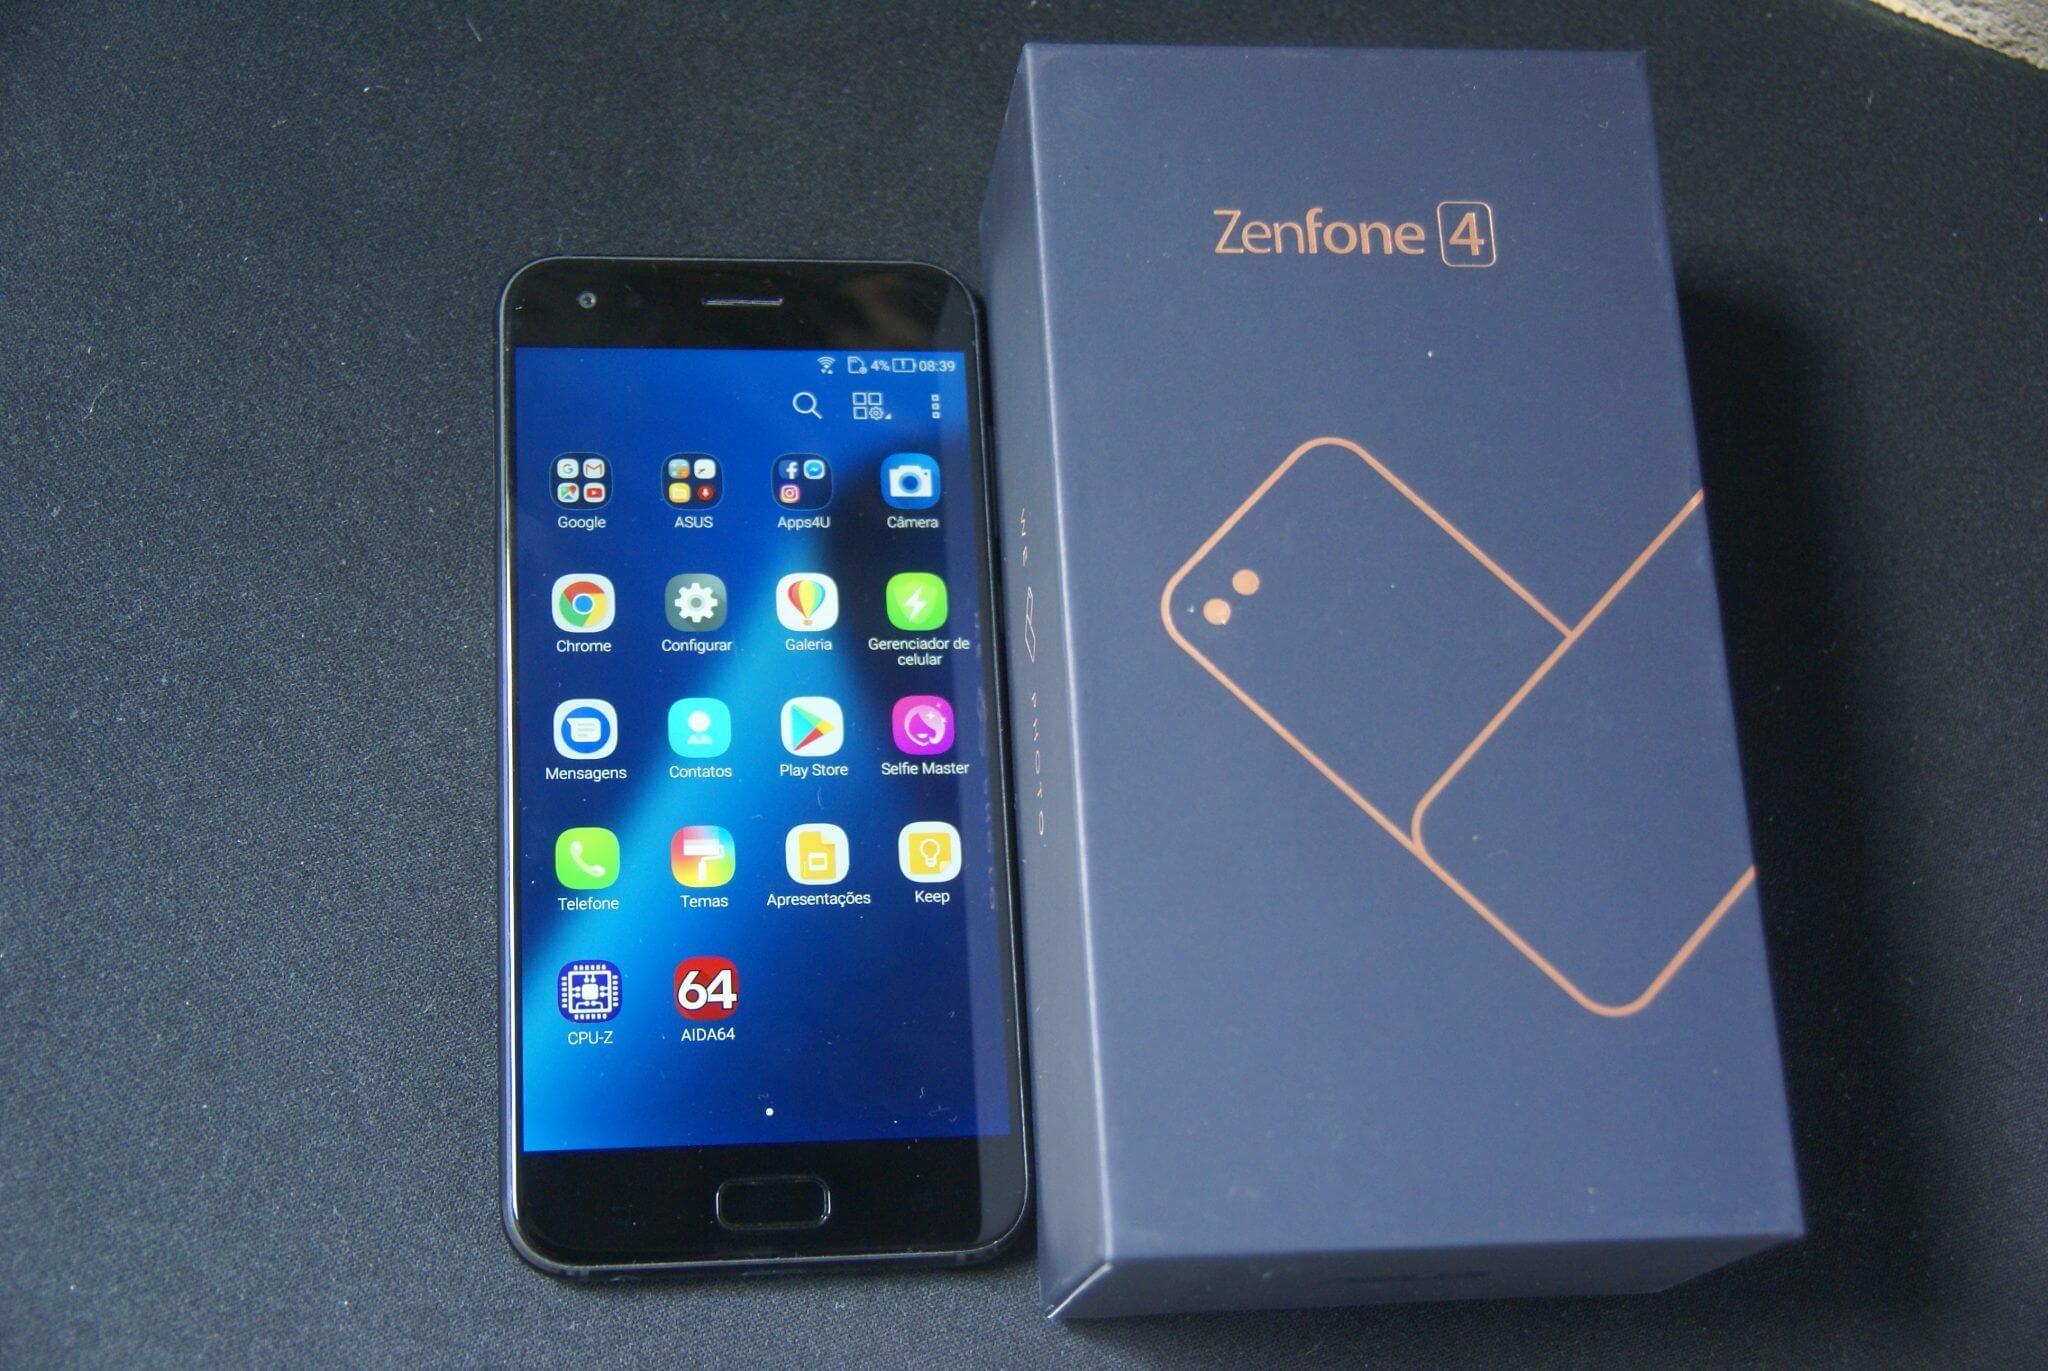 DSC06485 - HANDS-ON: Primeiras impressões do Zenfone 4